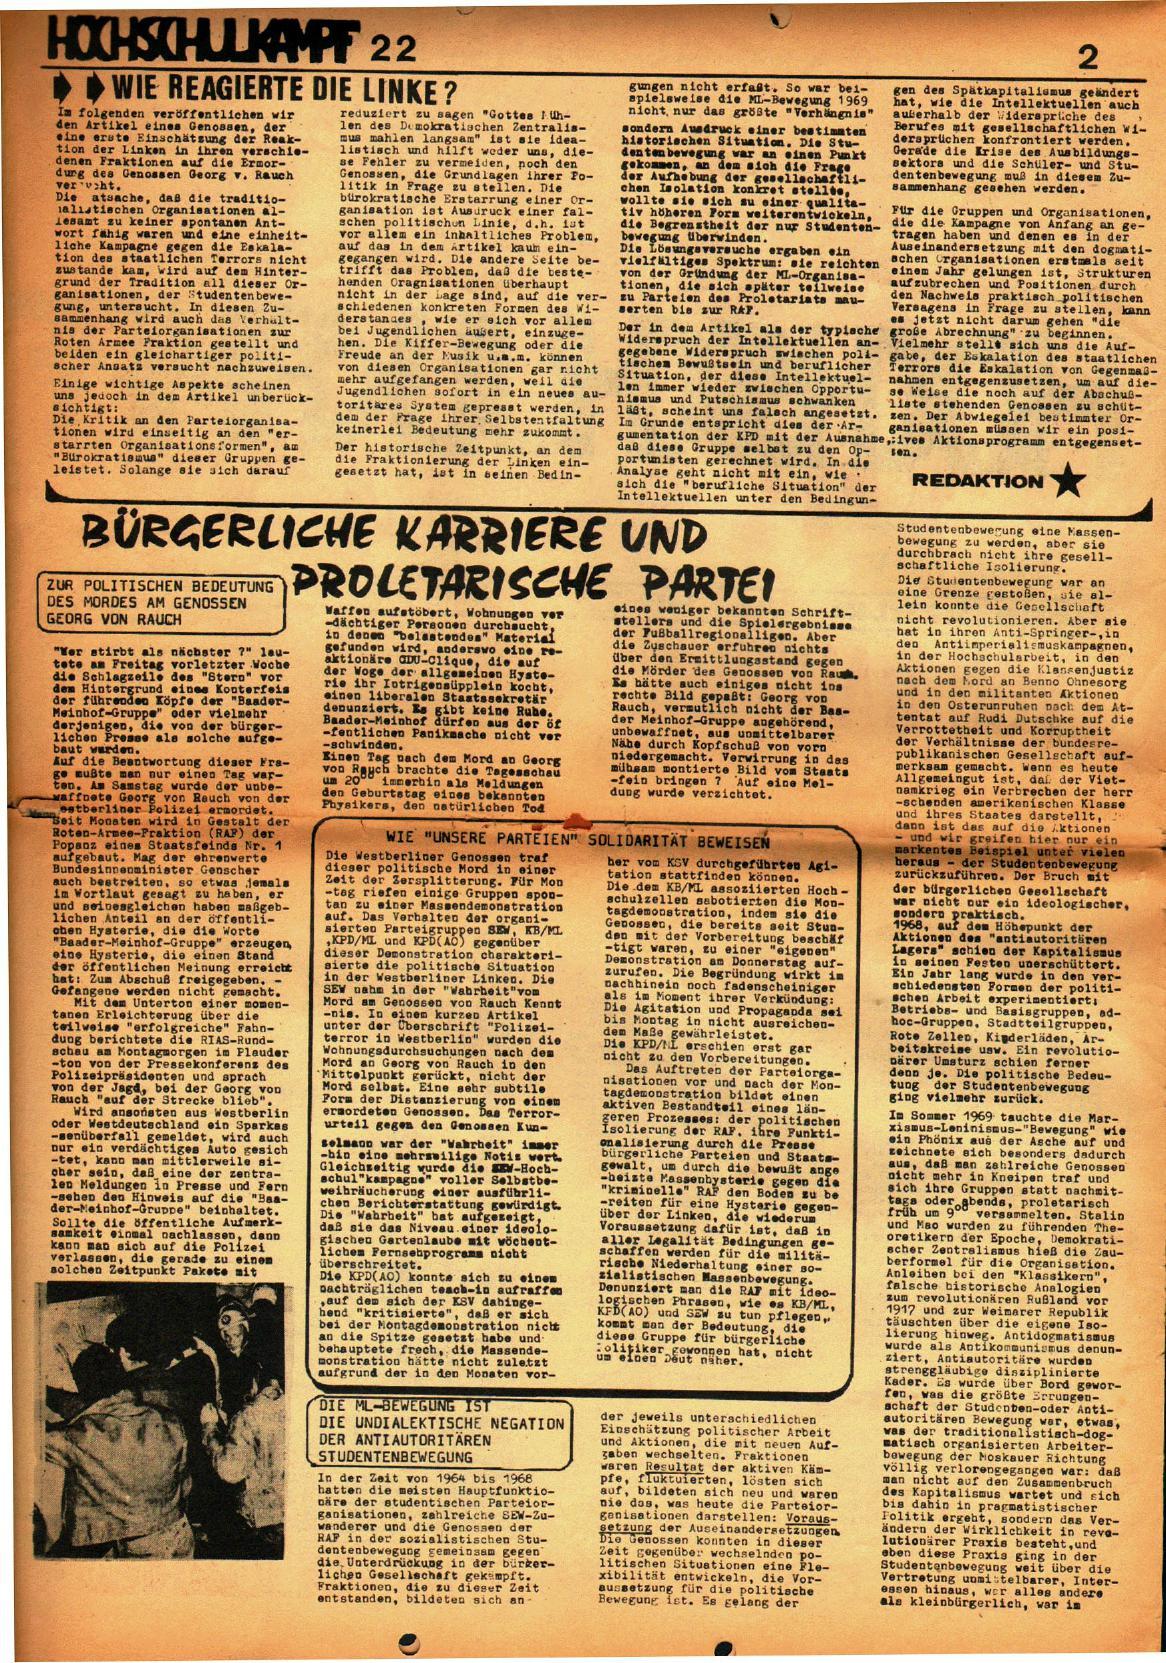 Berlin_Hochschulkampf_1971_22_02